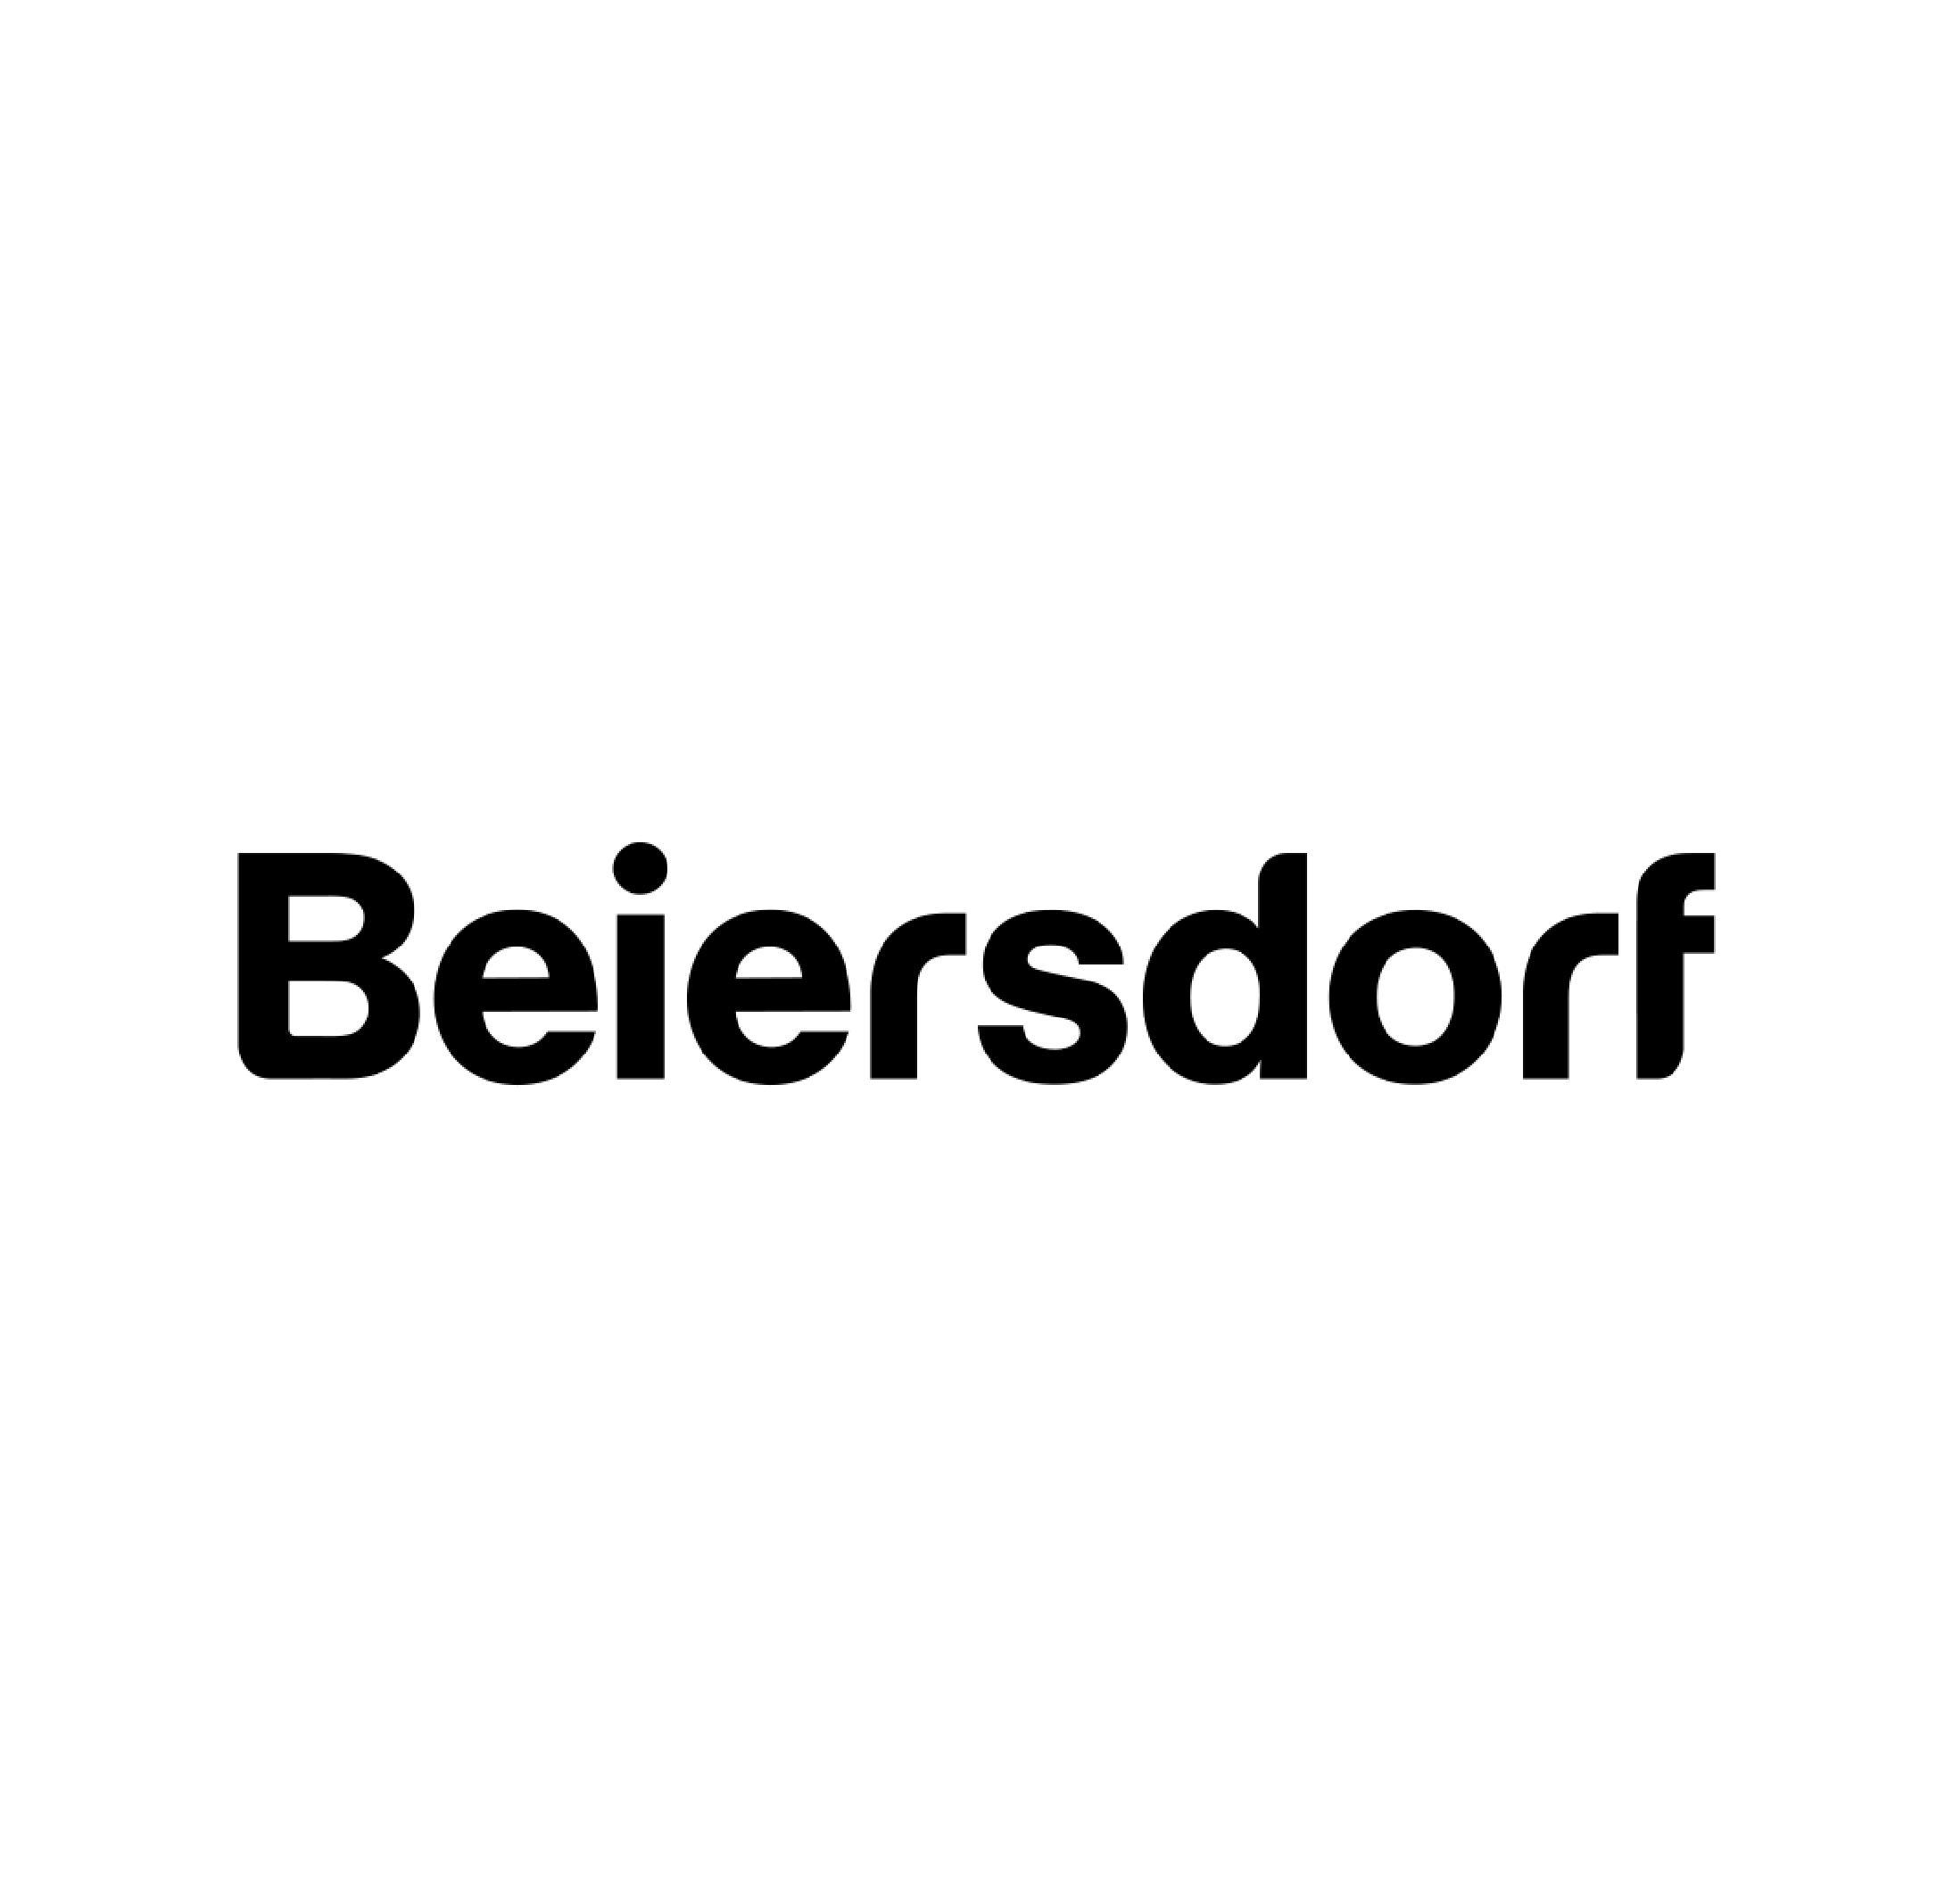 Beiresdorf